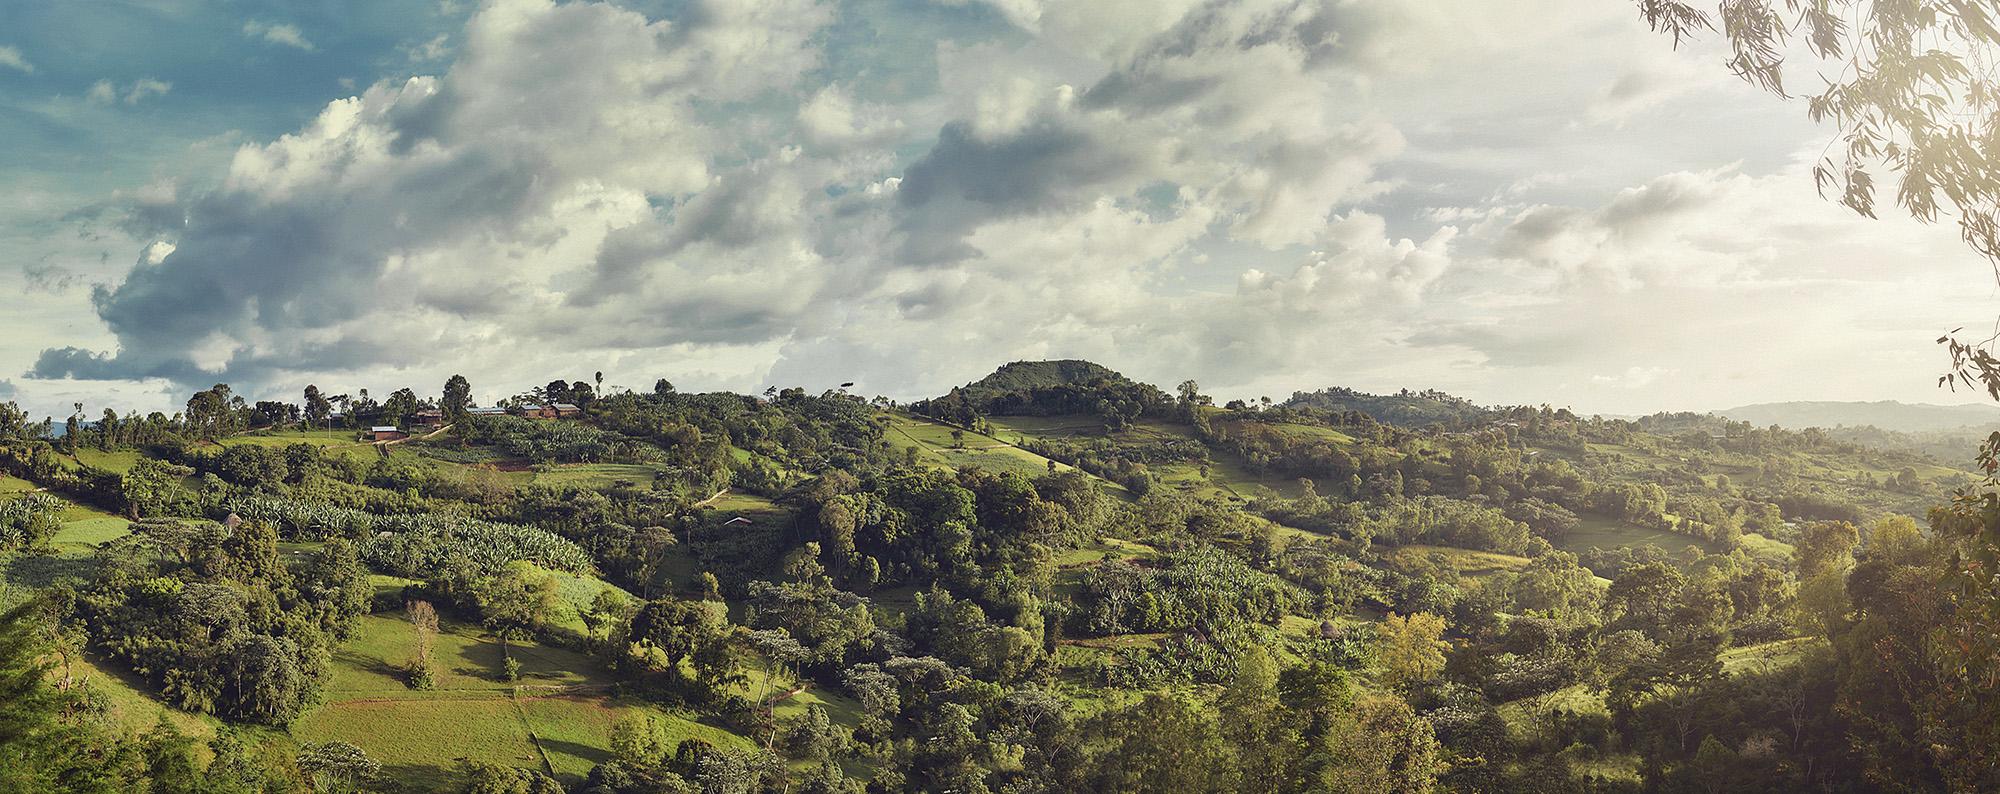 ethiopia landscape photography